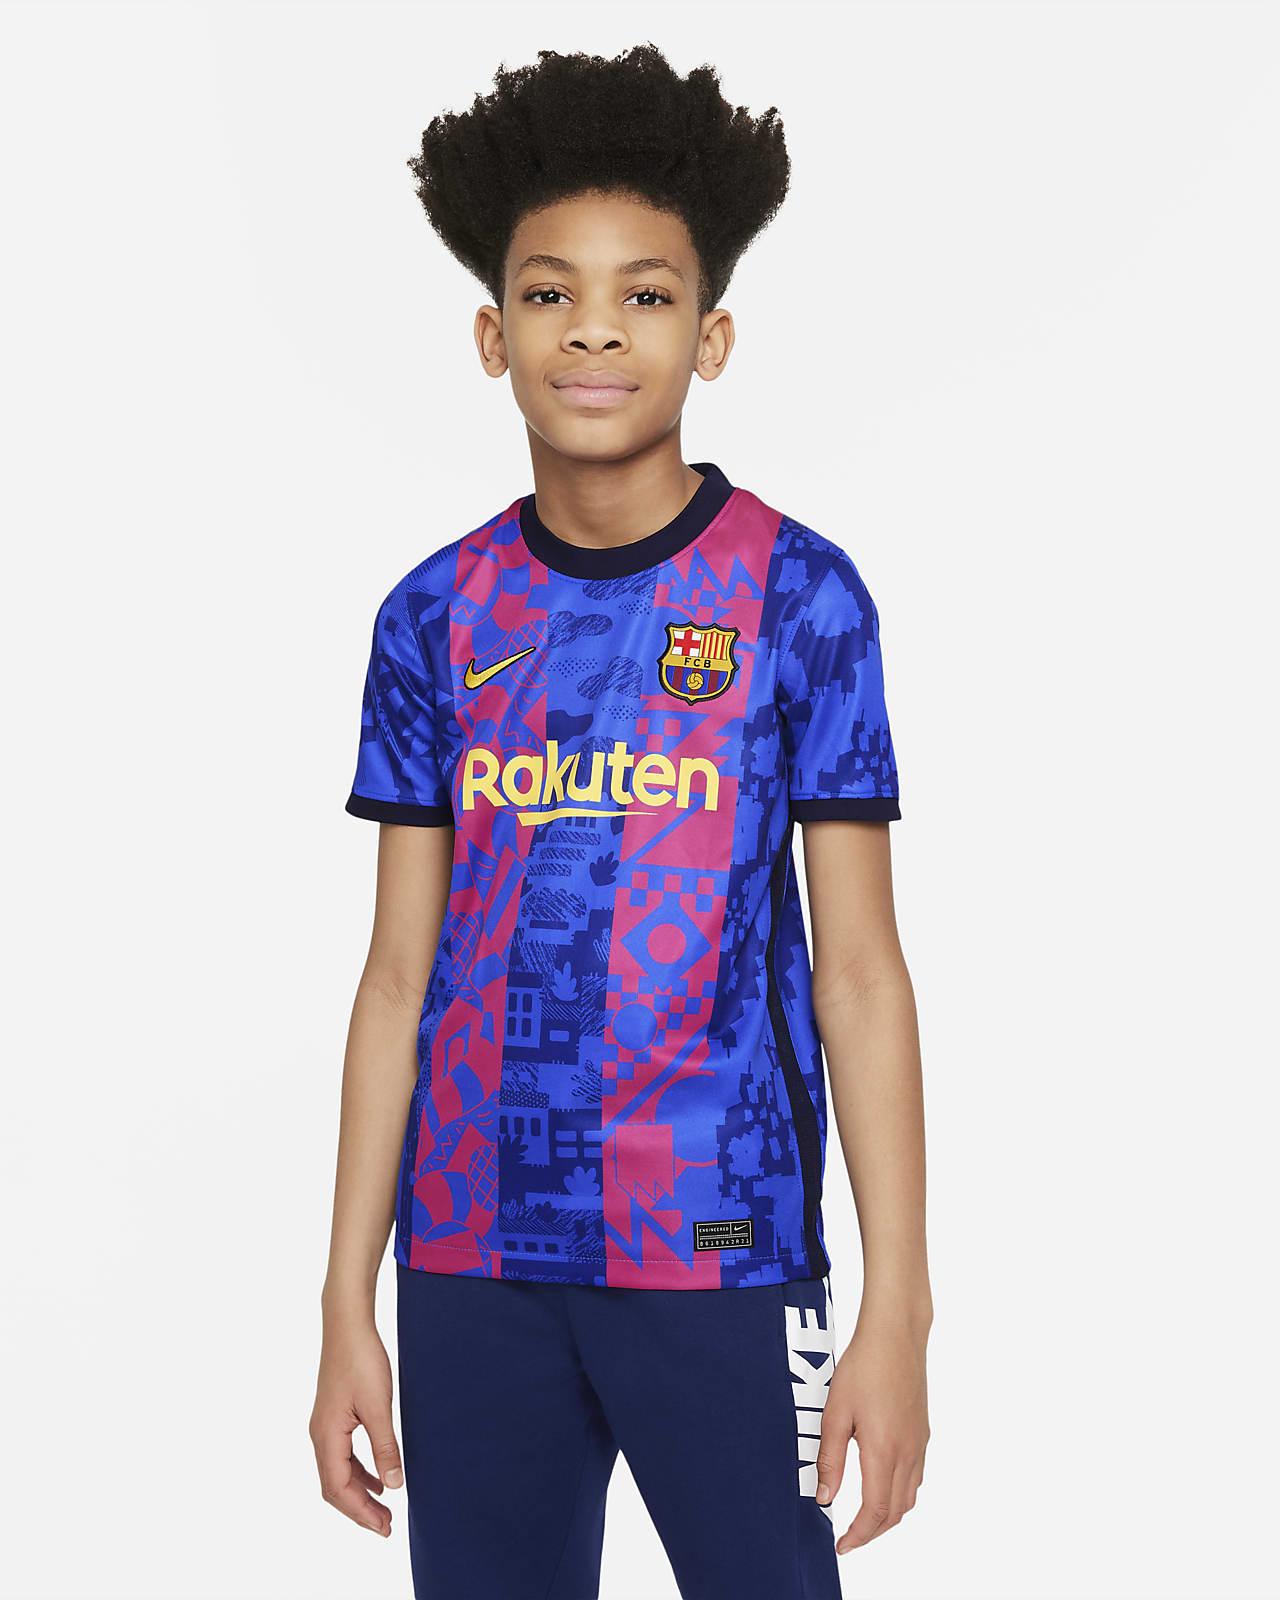 Jersey de fútbol Nike Dri-FIT del FC Barcelona alternativo 2021/22 Stadium para niños talla grande